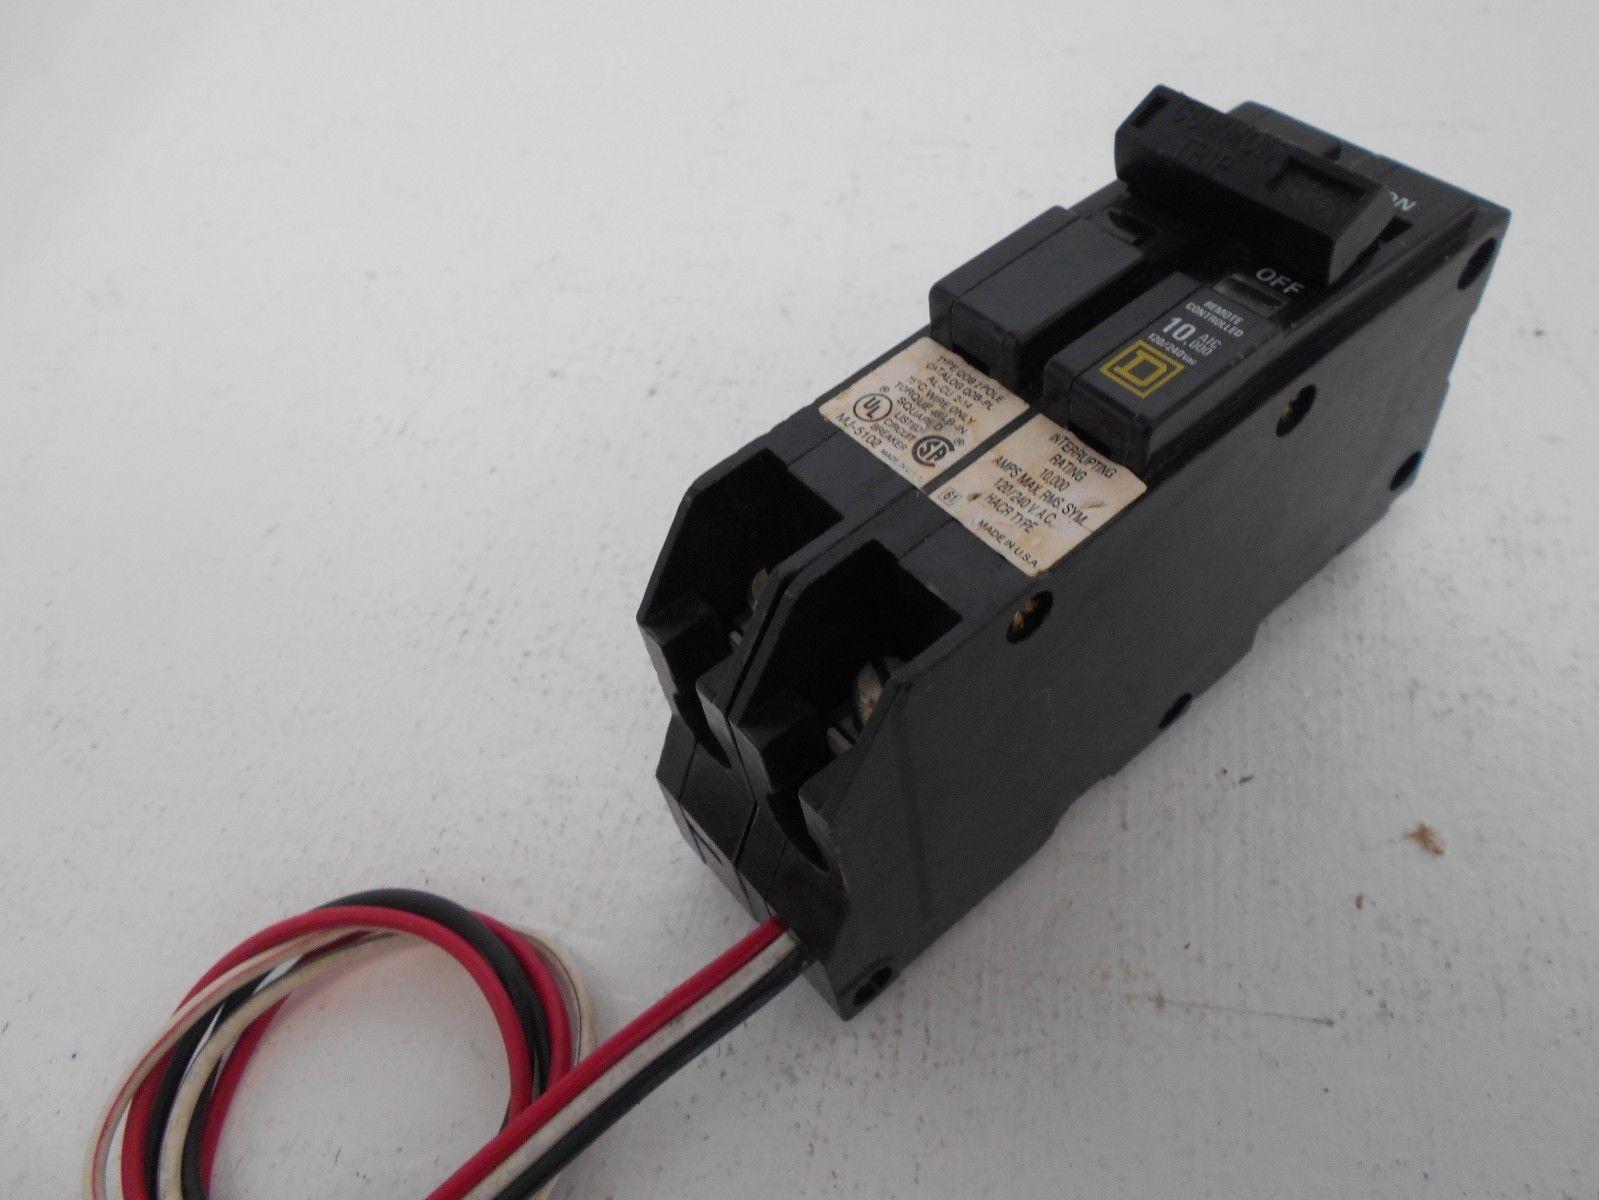 SQUARE D QOB250PL 2 POLE 50 AMP 240V QOB CIRCUIT BREAKER FOR ...